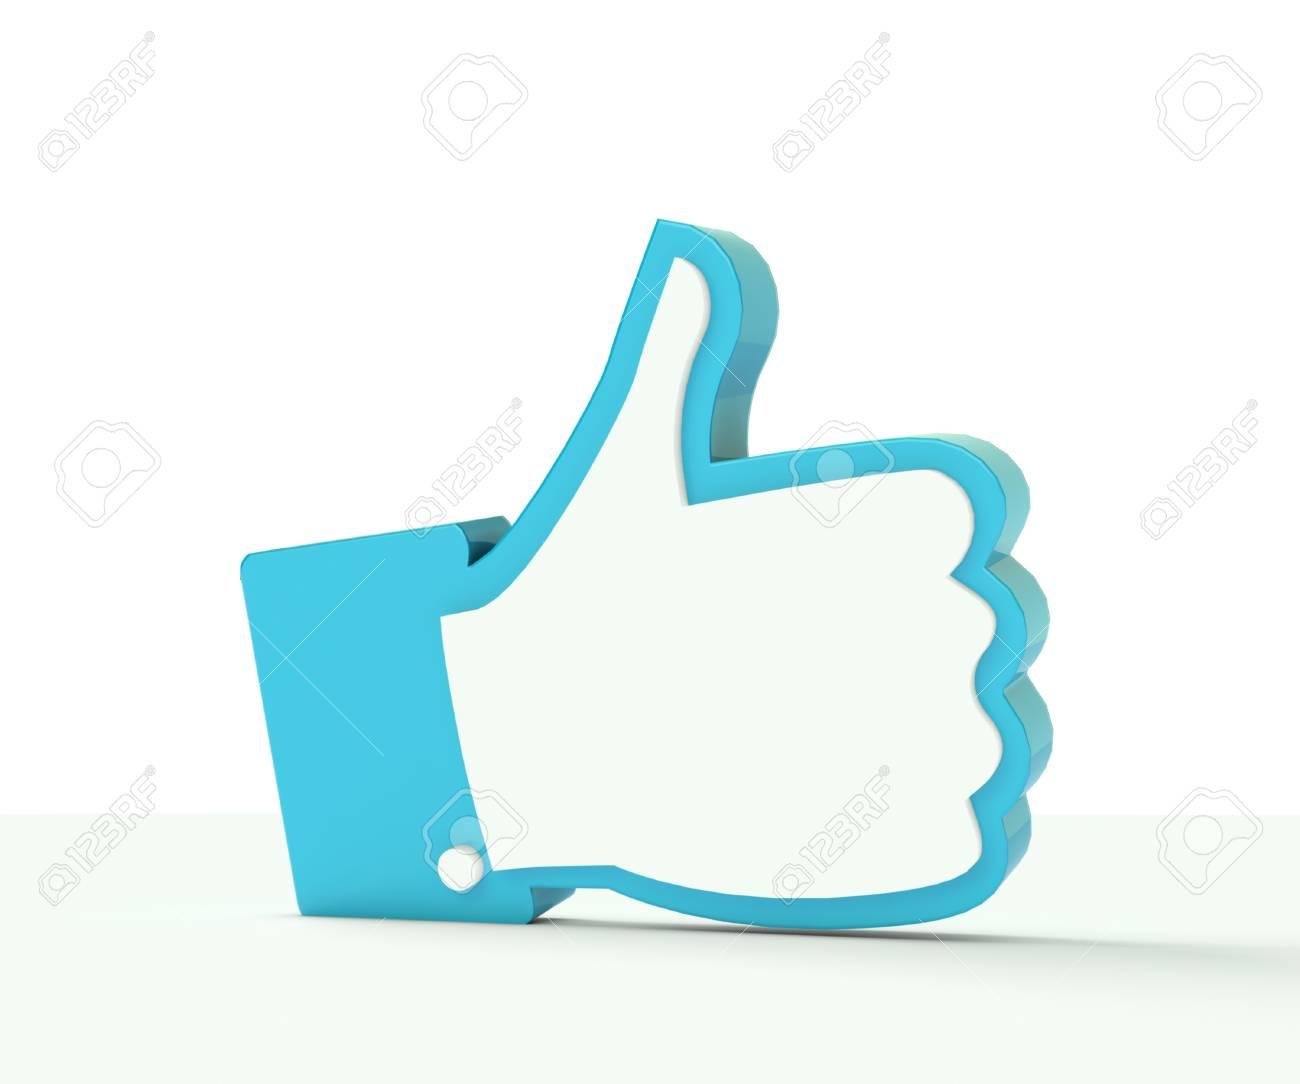 3D thumb up social media illustration photo Stock Photo - 20273035